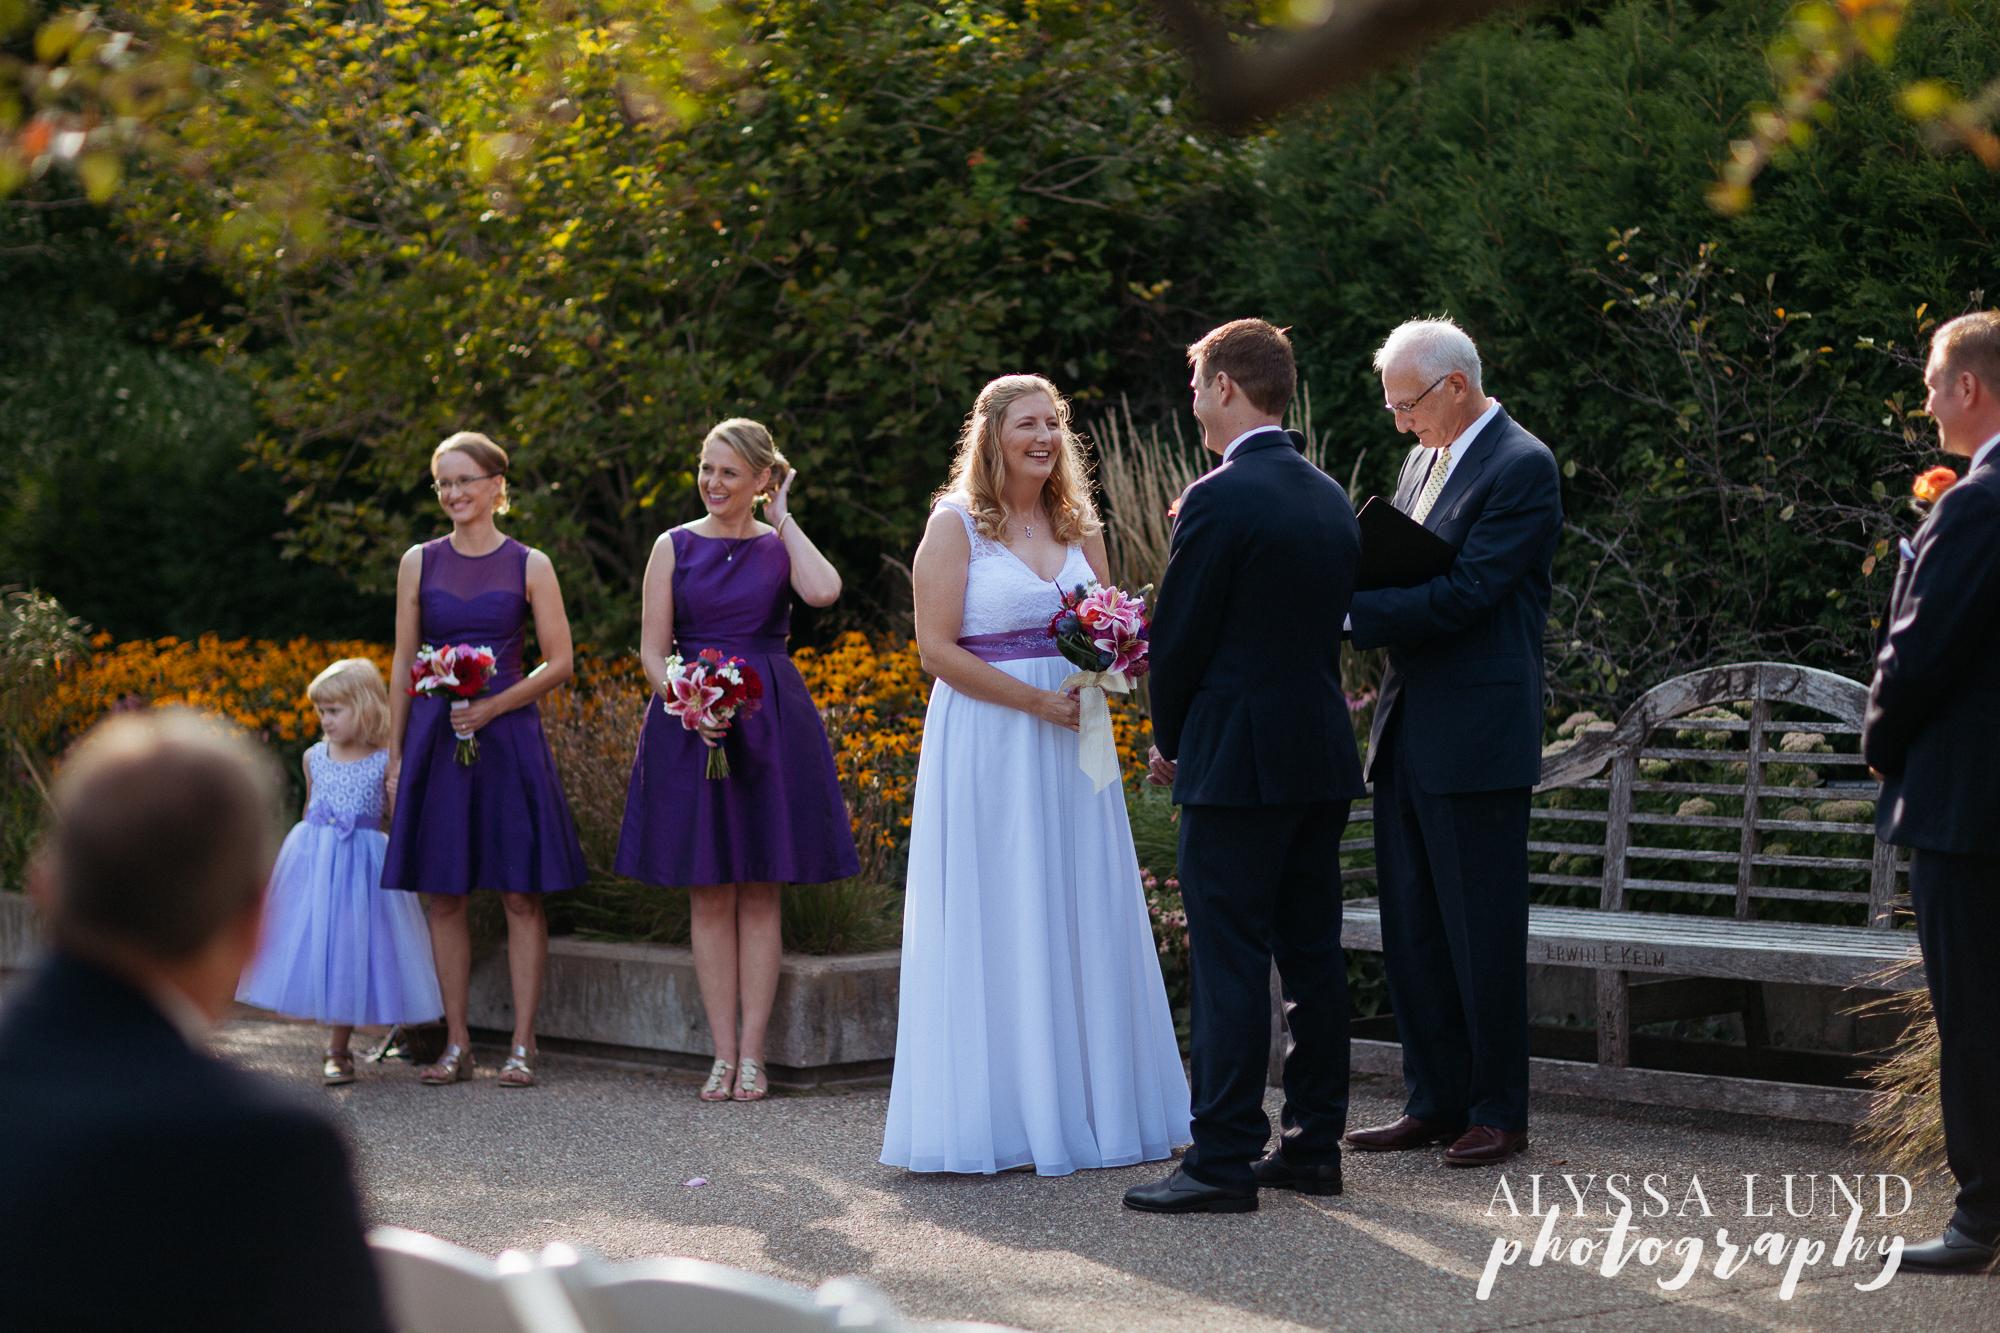 Minneapolis Outdoor Wedding by Alyssa Lund Photography